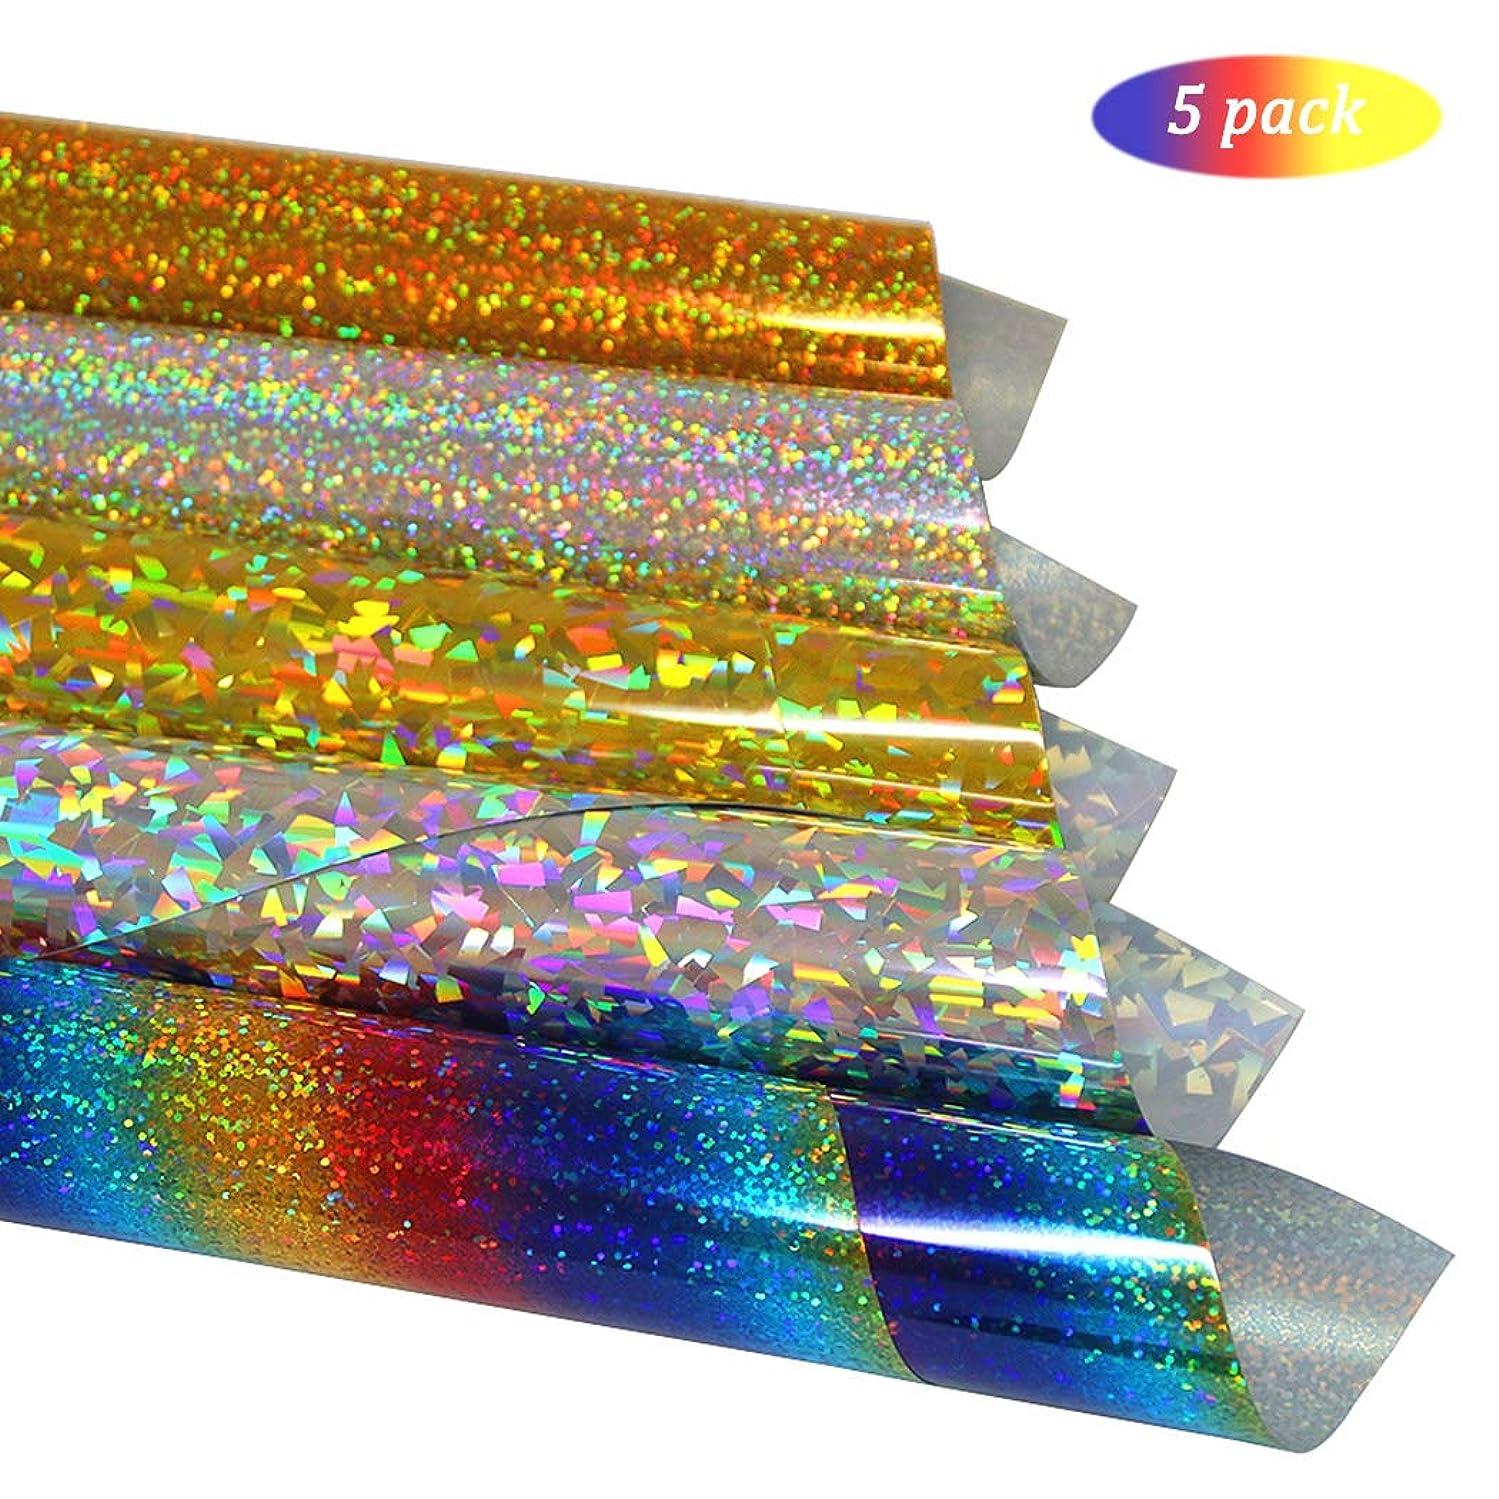 Holographic Heat Transfer Vinyl Bundle Glitter Rainbow HTV Iron on Vinyl for T-Shirts, Garment and Bags, 10